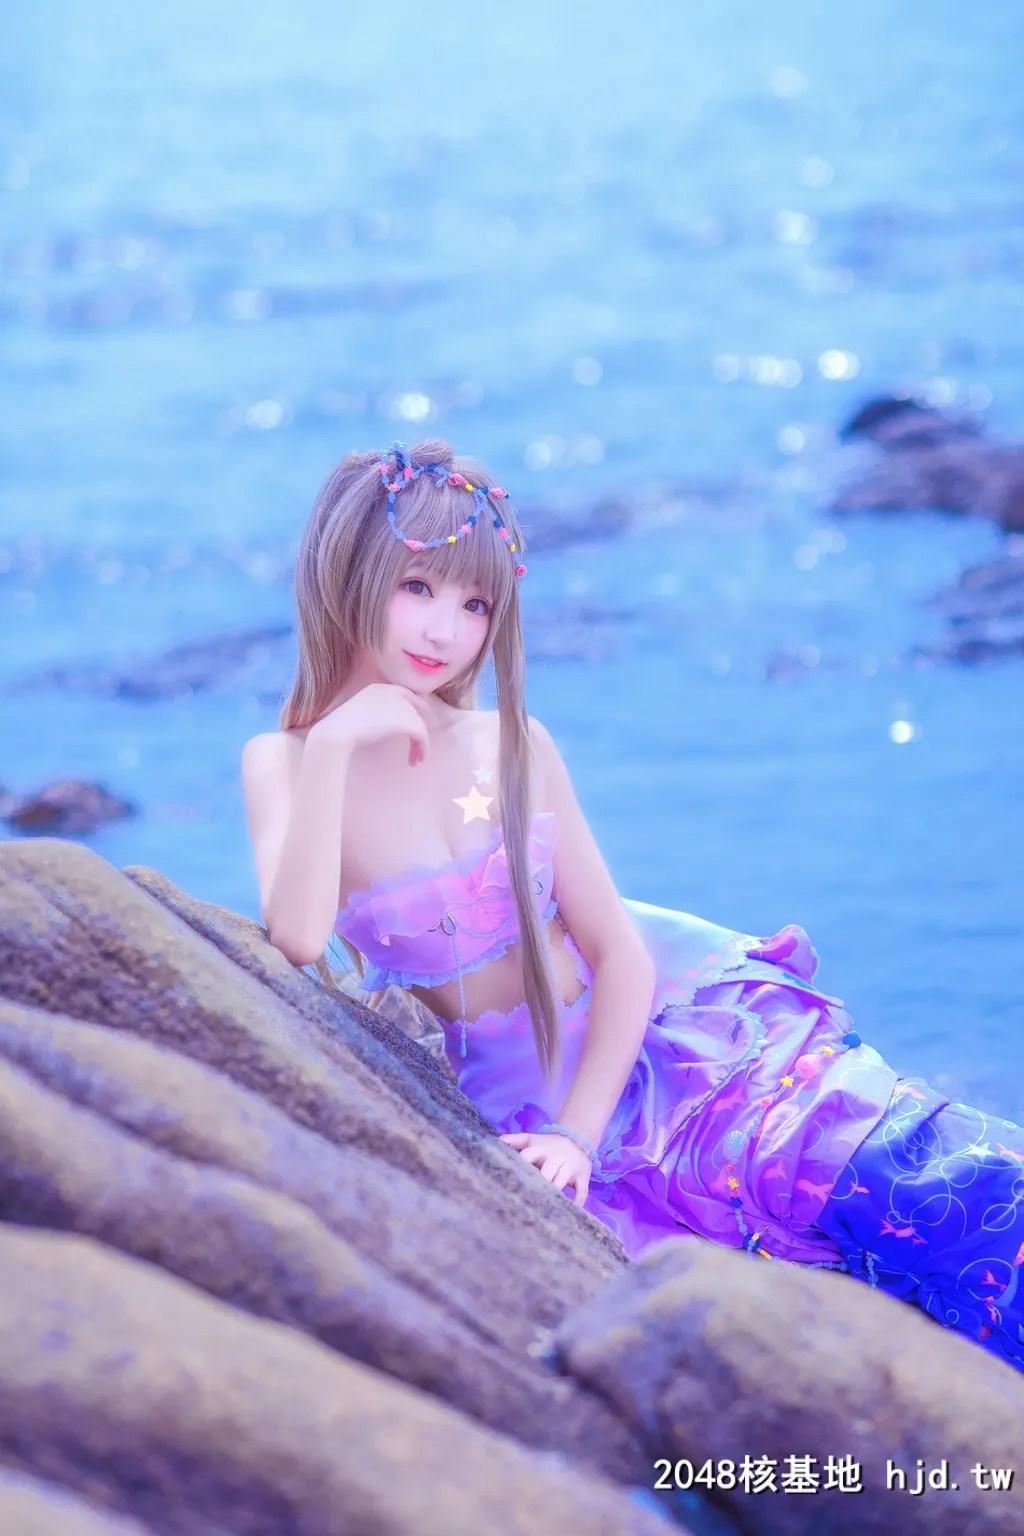 《Love Live!》南小鸟美人鱼Cosplay【CN:南咲咲咲QVQ】 (11P)插图(2)